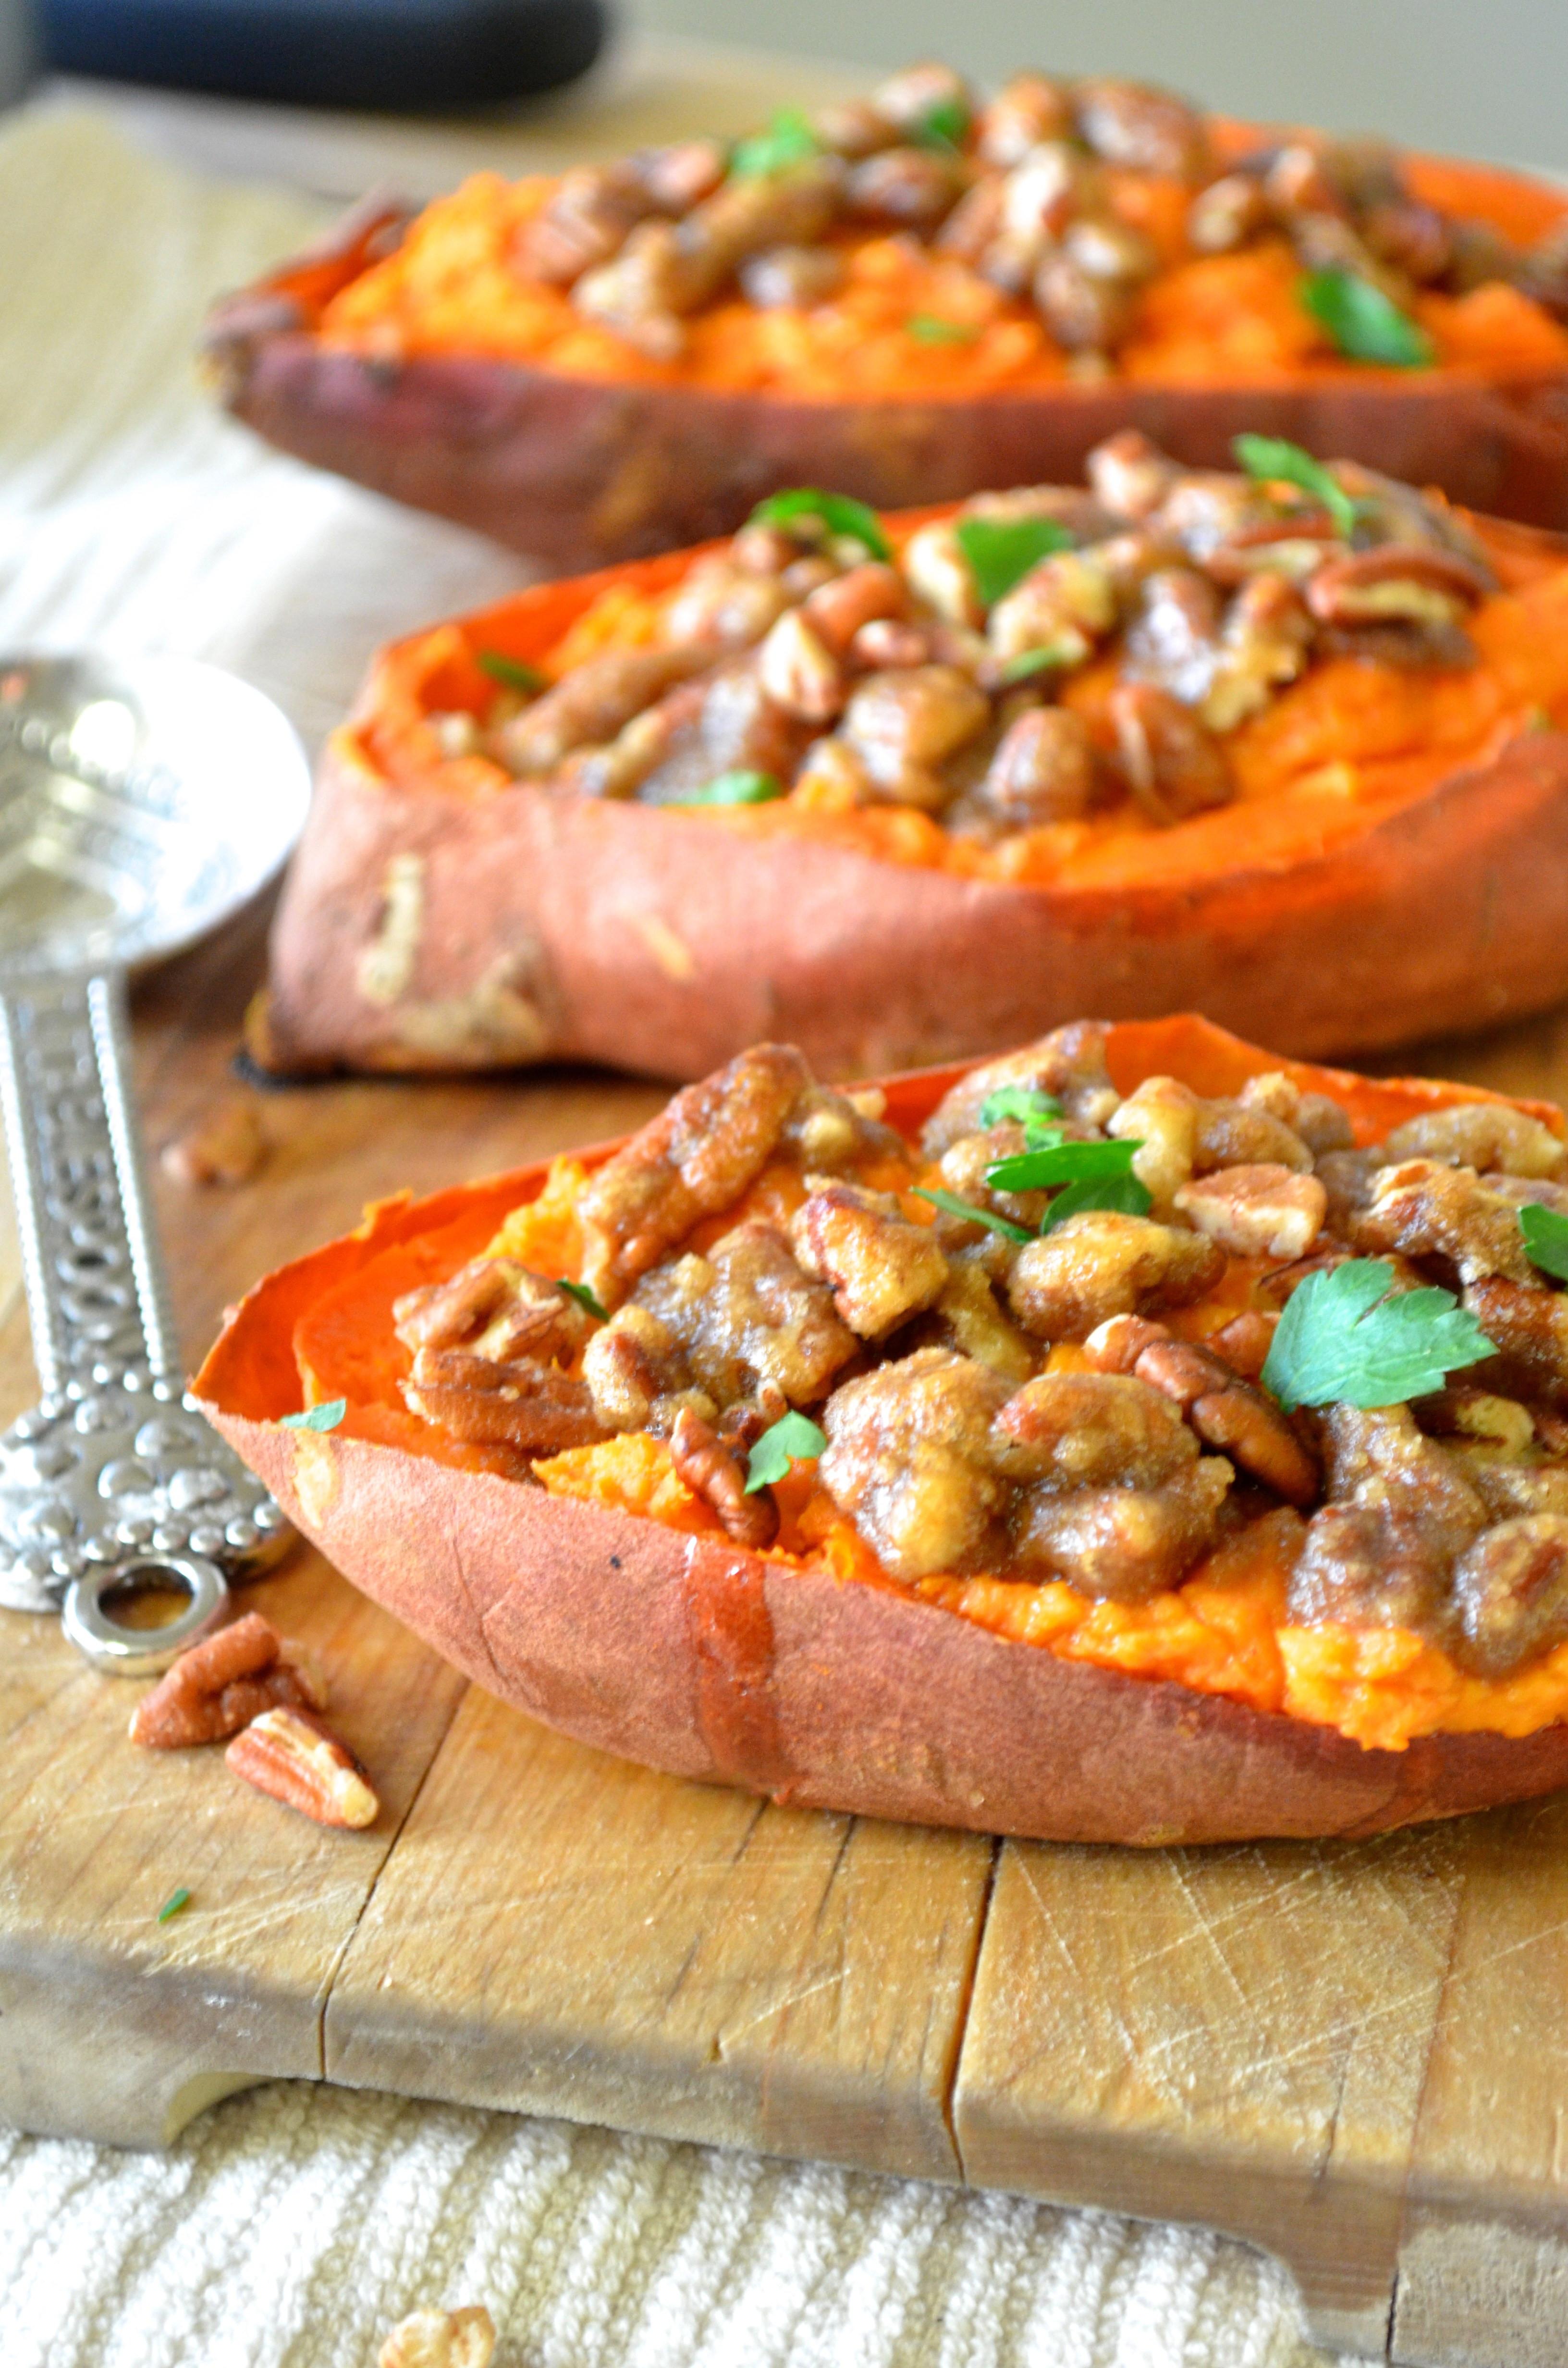 Healthy Roasted Sweet Potatoes  Twice Baked Sweet Potatoes with Pecan Streusel Apple of